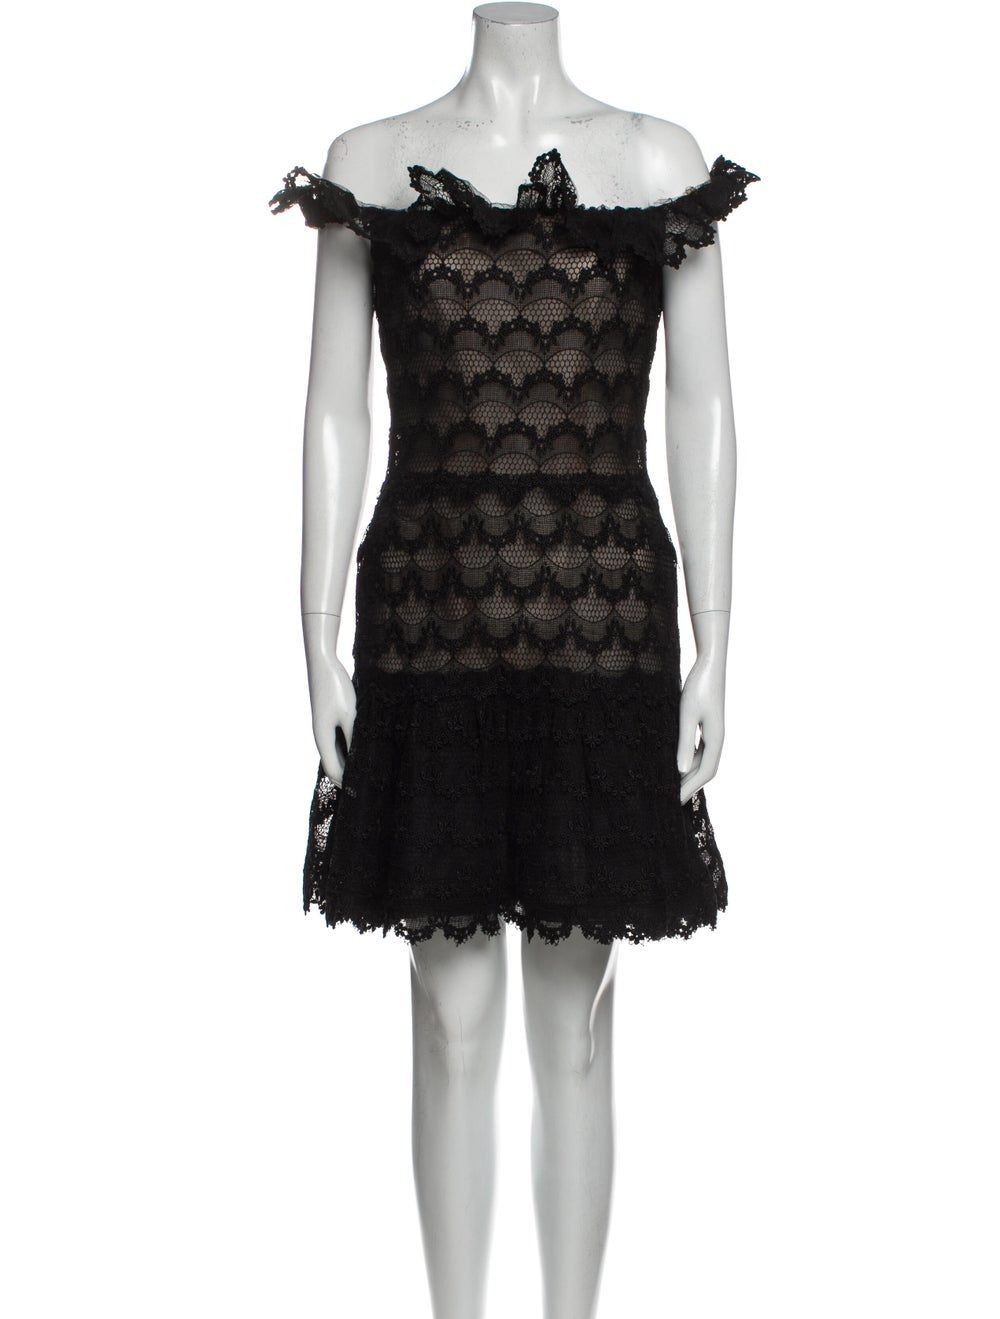 Arnold Scaasi Cowl Neck Mini Dress Black - image 1